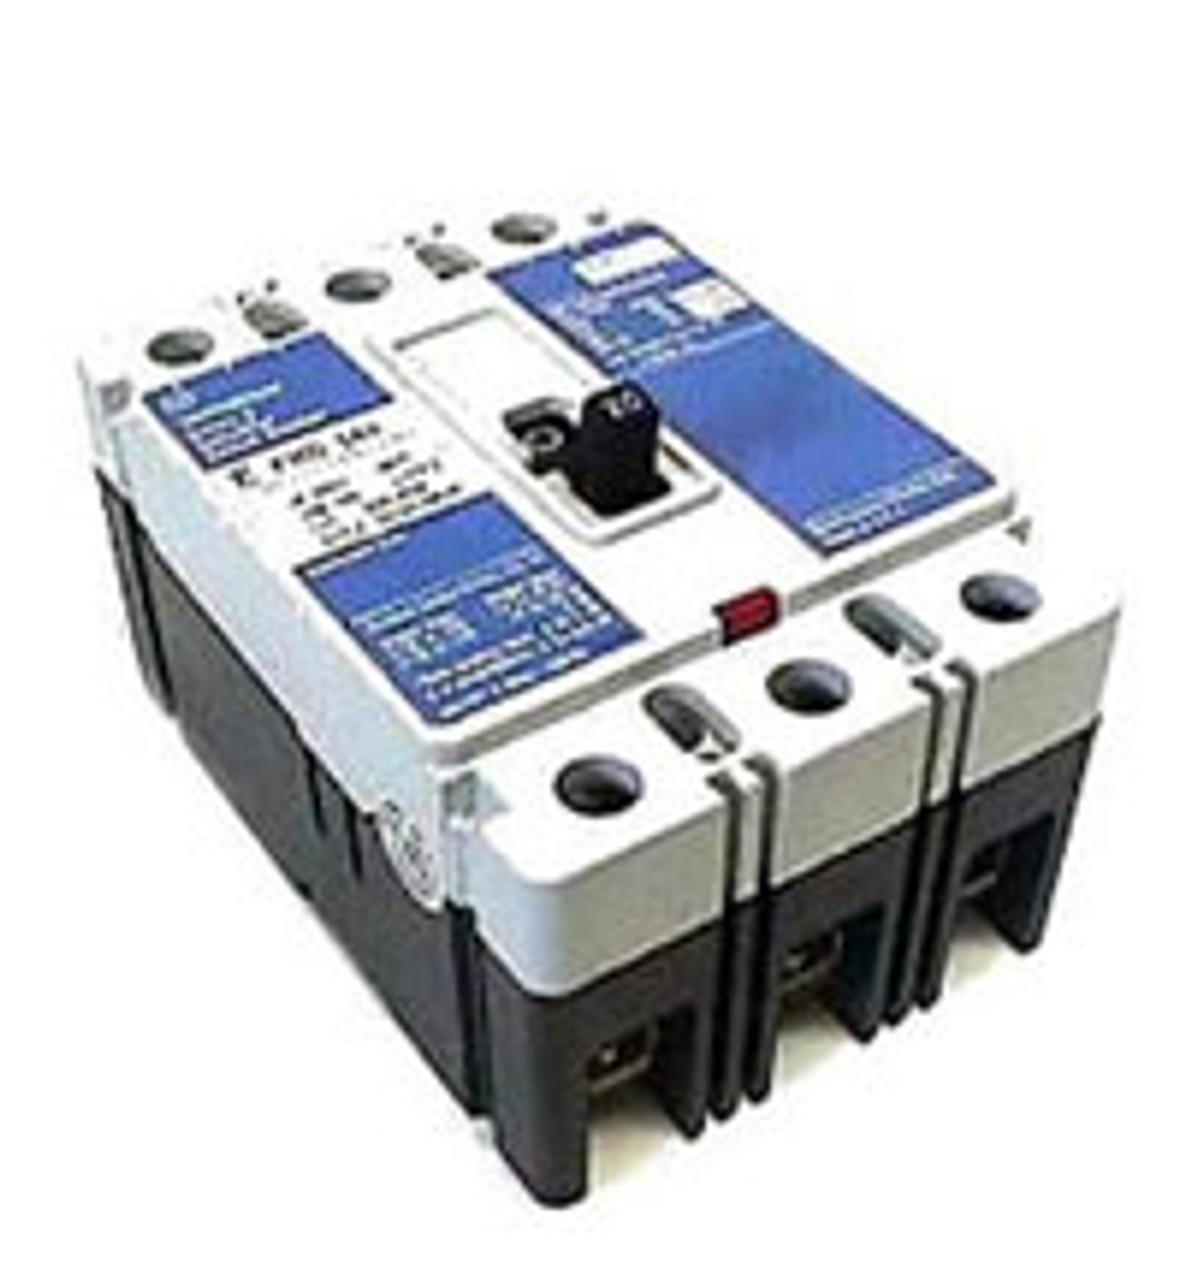 Westinghouse EHD3030 3 Pole 30 Amp 480 VAC Circuit Breaker - New